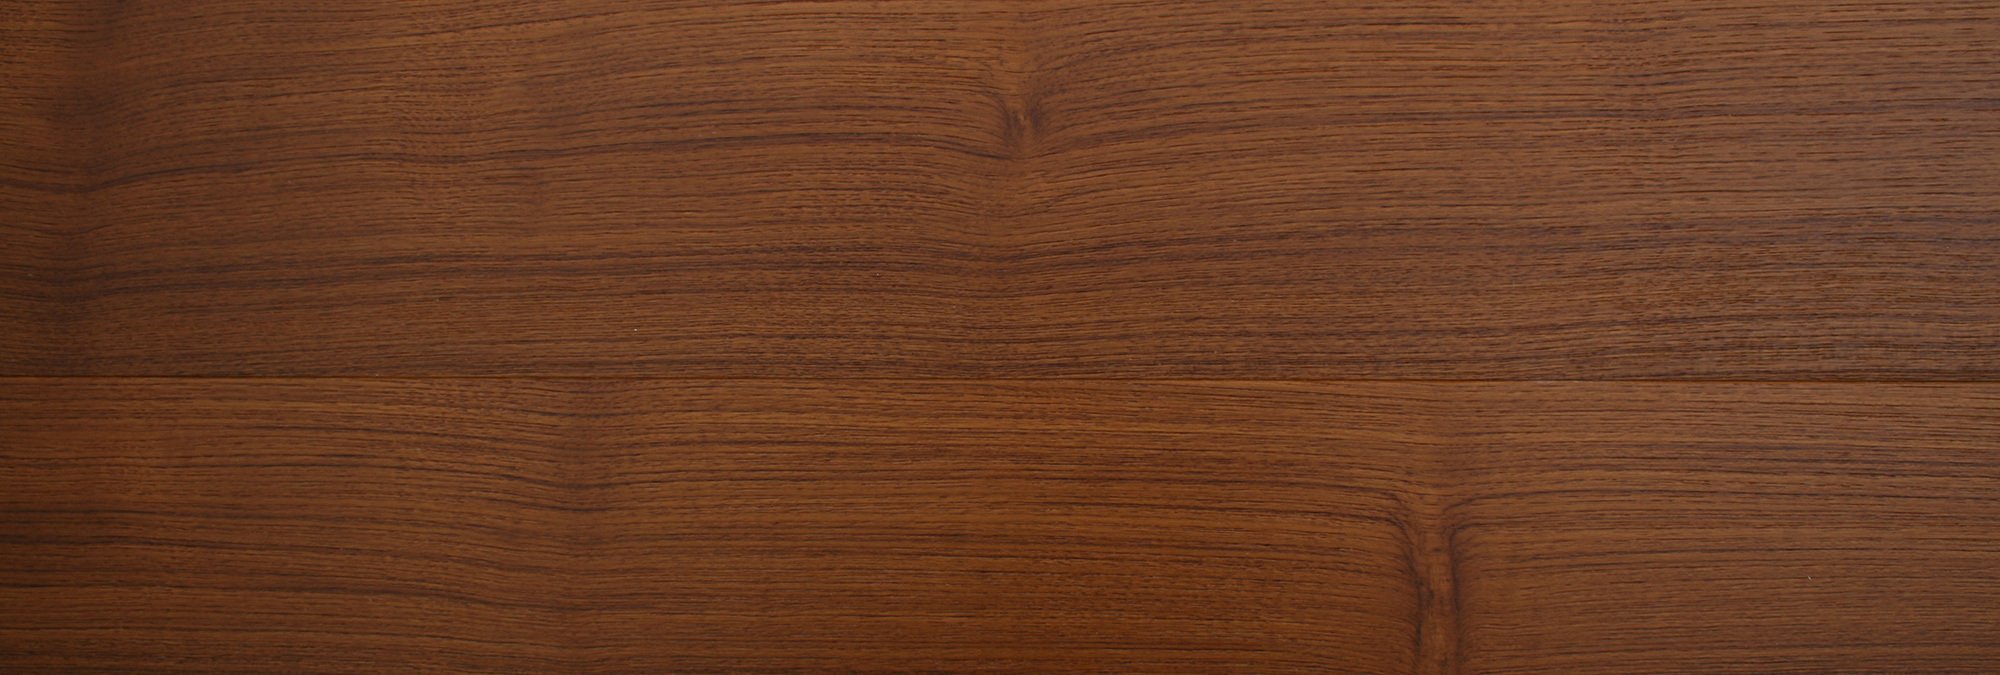 pavimenti in legno Teak